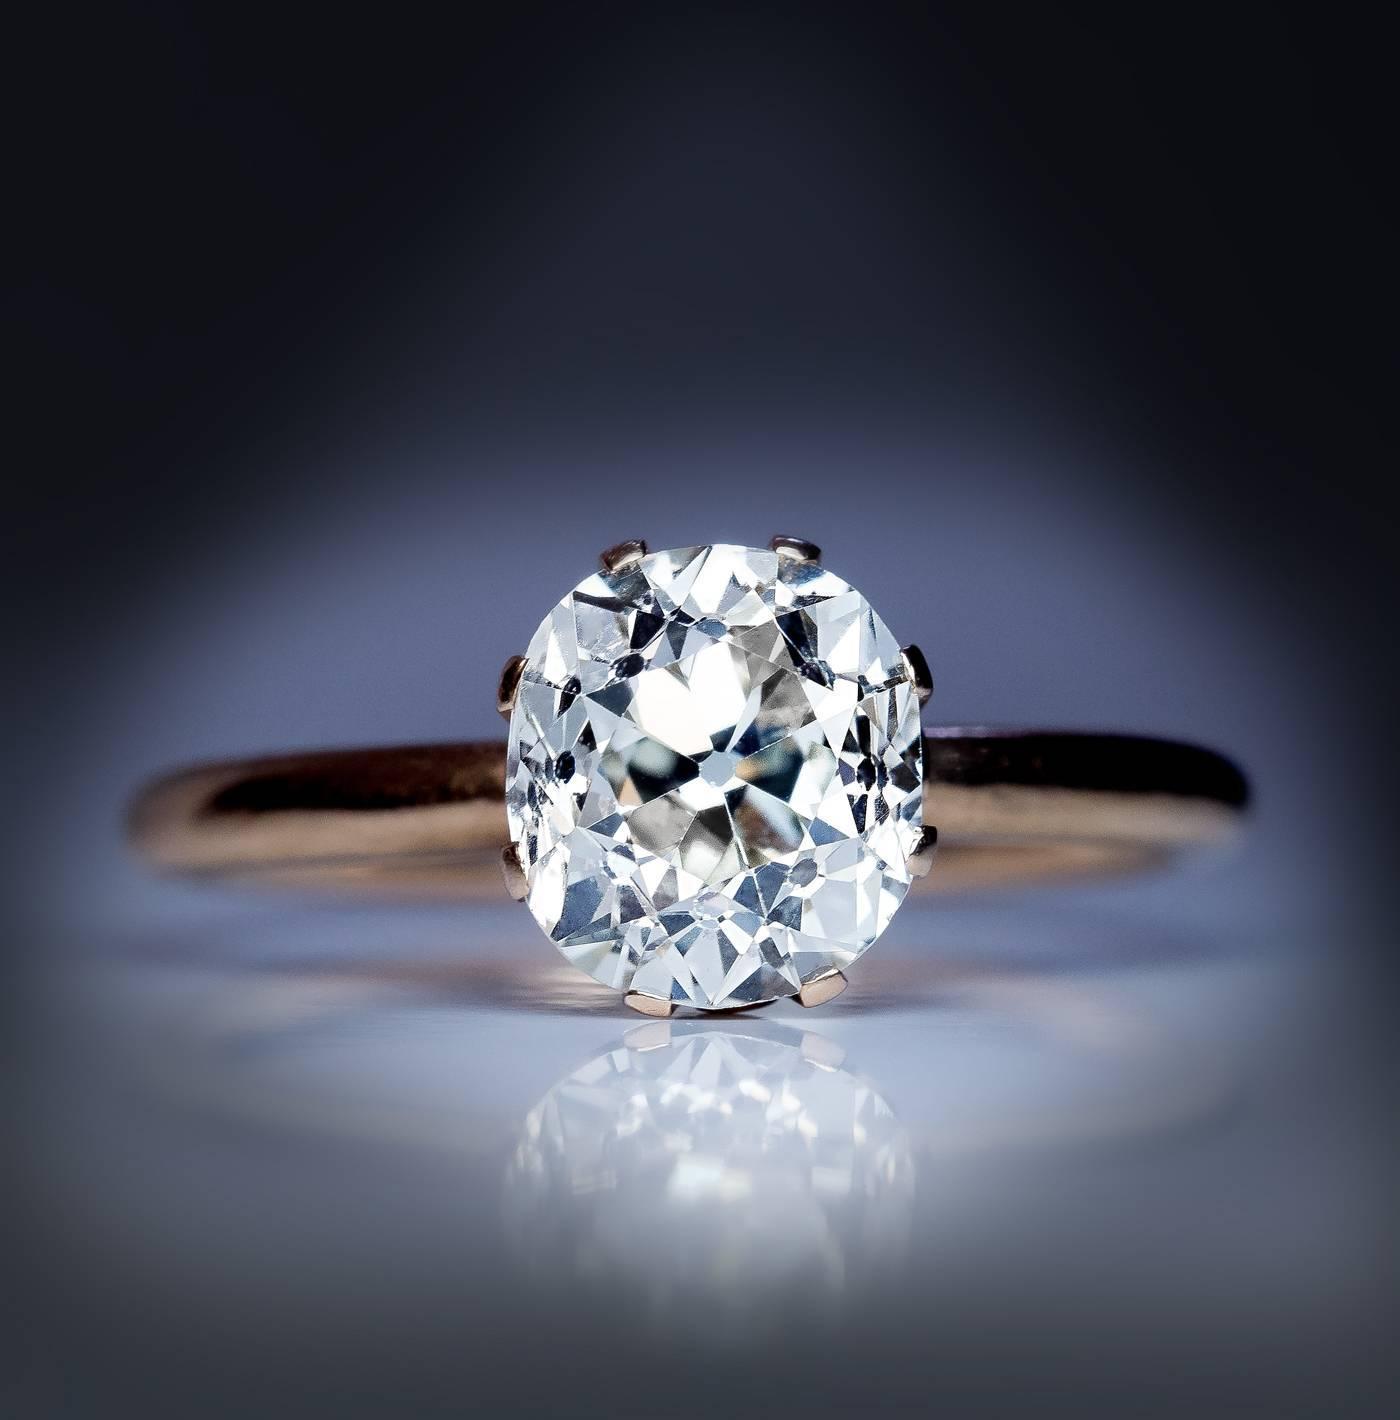 Antique Russian 2 66 Carat Cushion Cut Diamond Gold Engagement Ring at 1stdibs